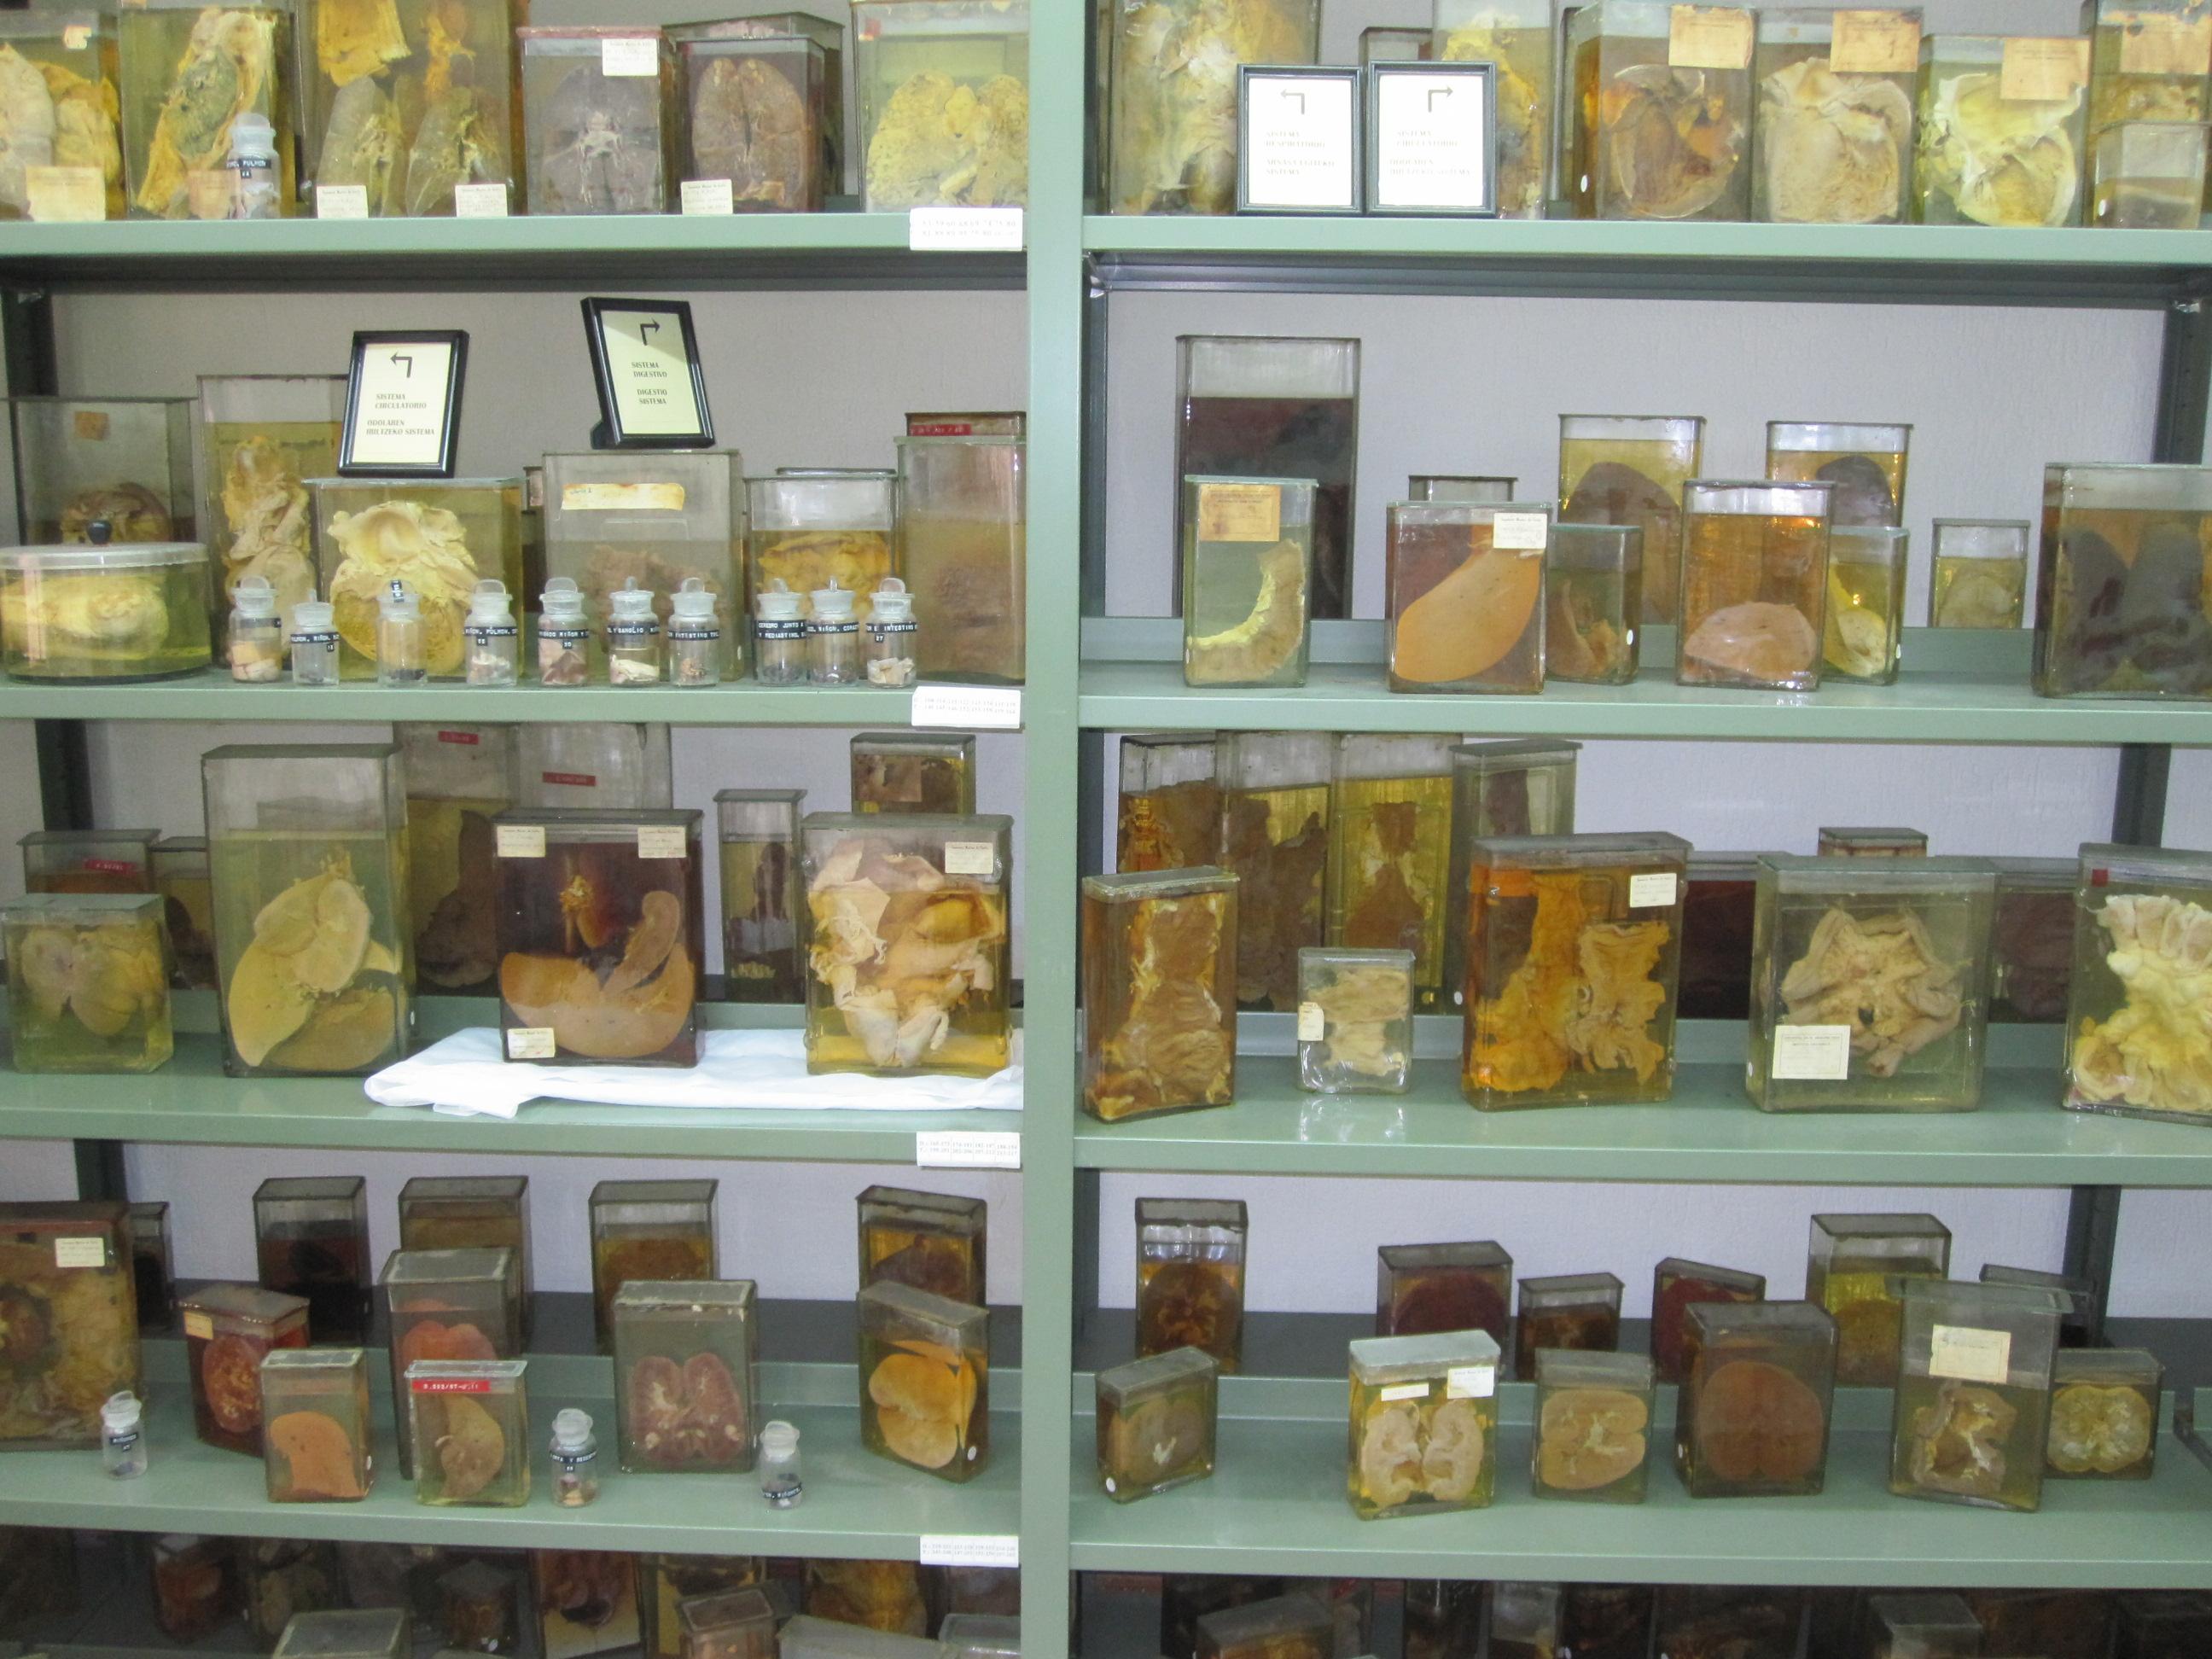 File:7.- Pathological Anatomy Room.jpg - Wikimedia Commons